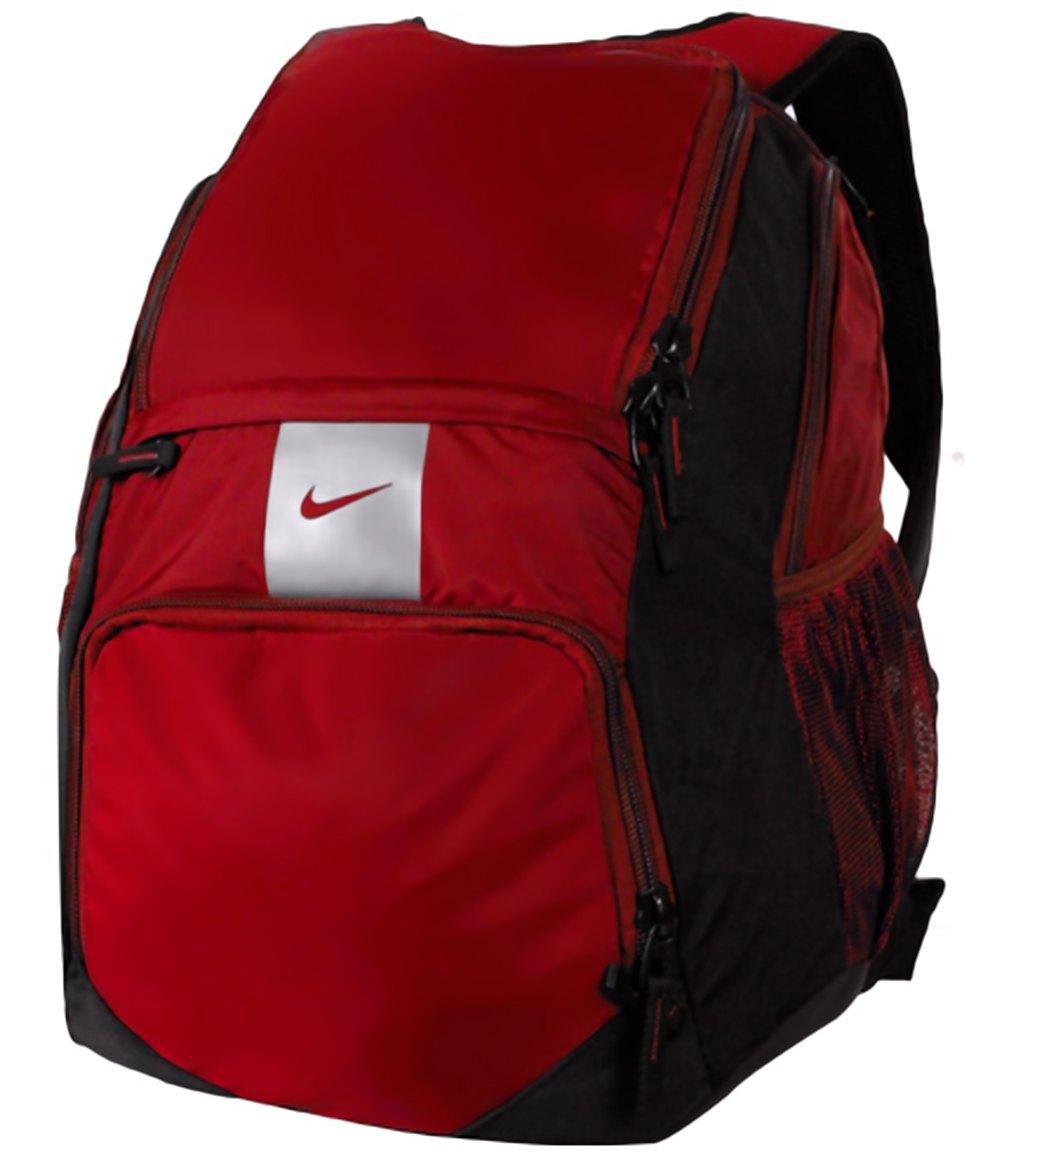 d2d35af338 Nike Swim Solid Team Backpack at SwimOutlet.com - Free Shipping